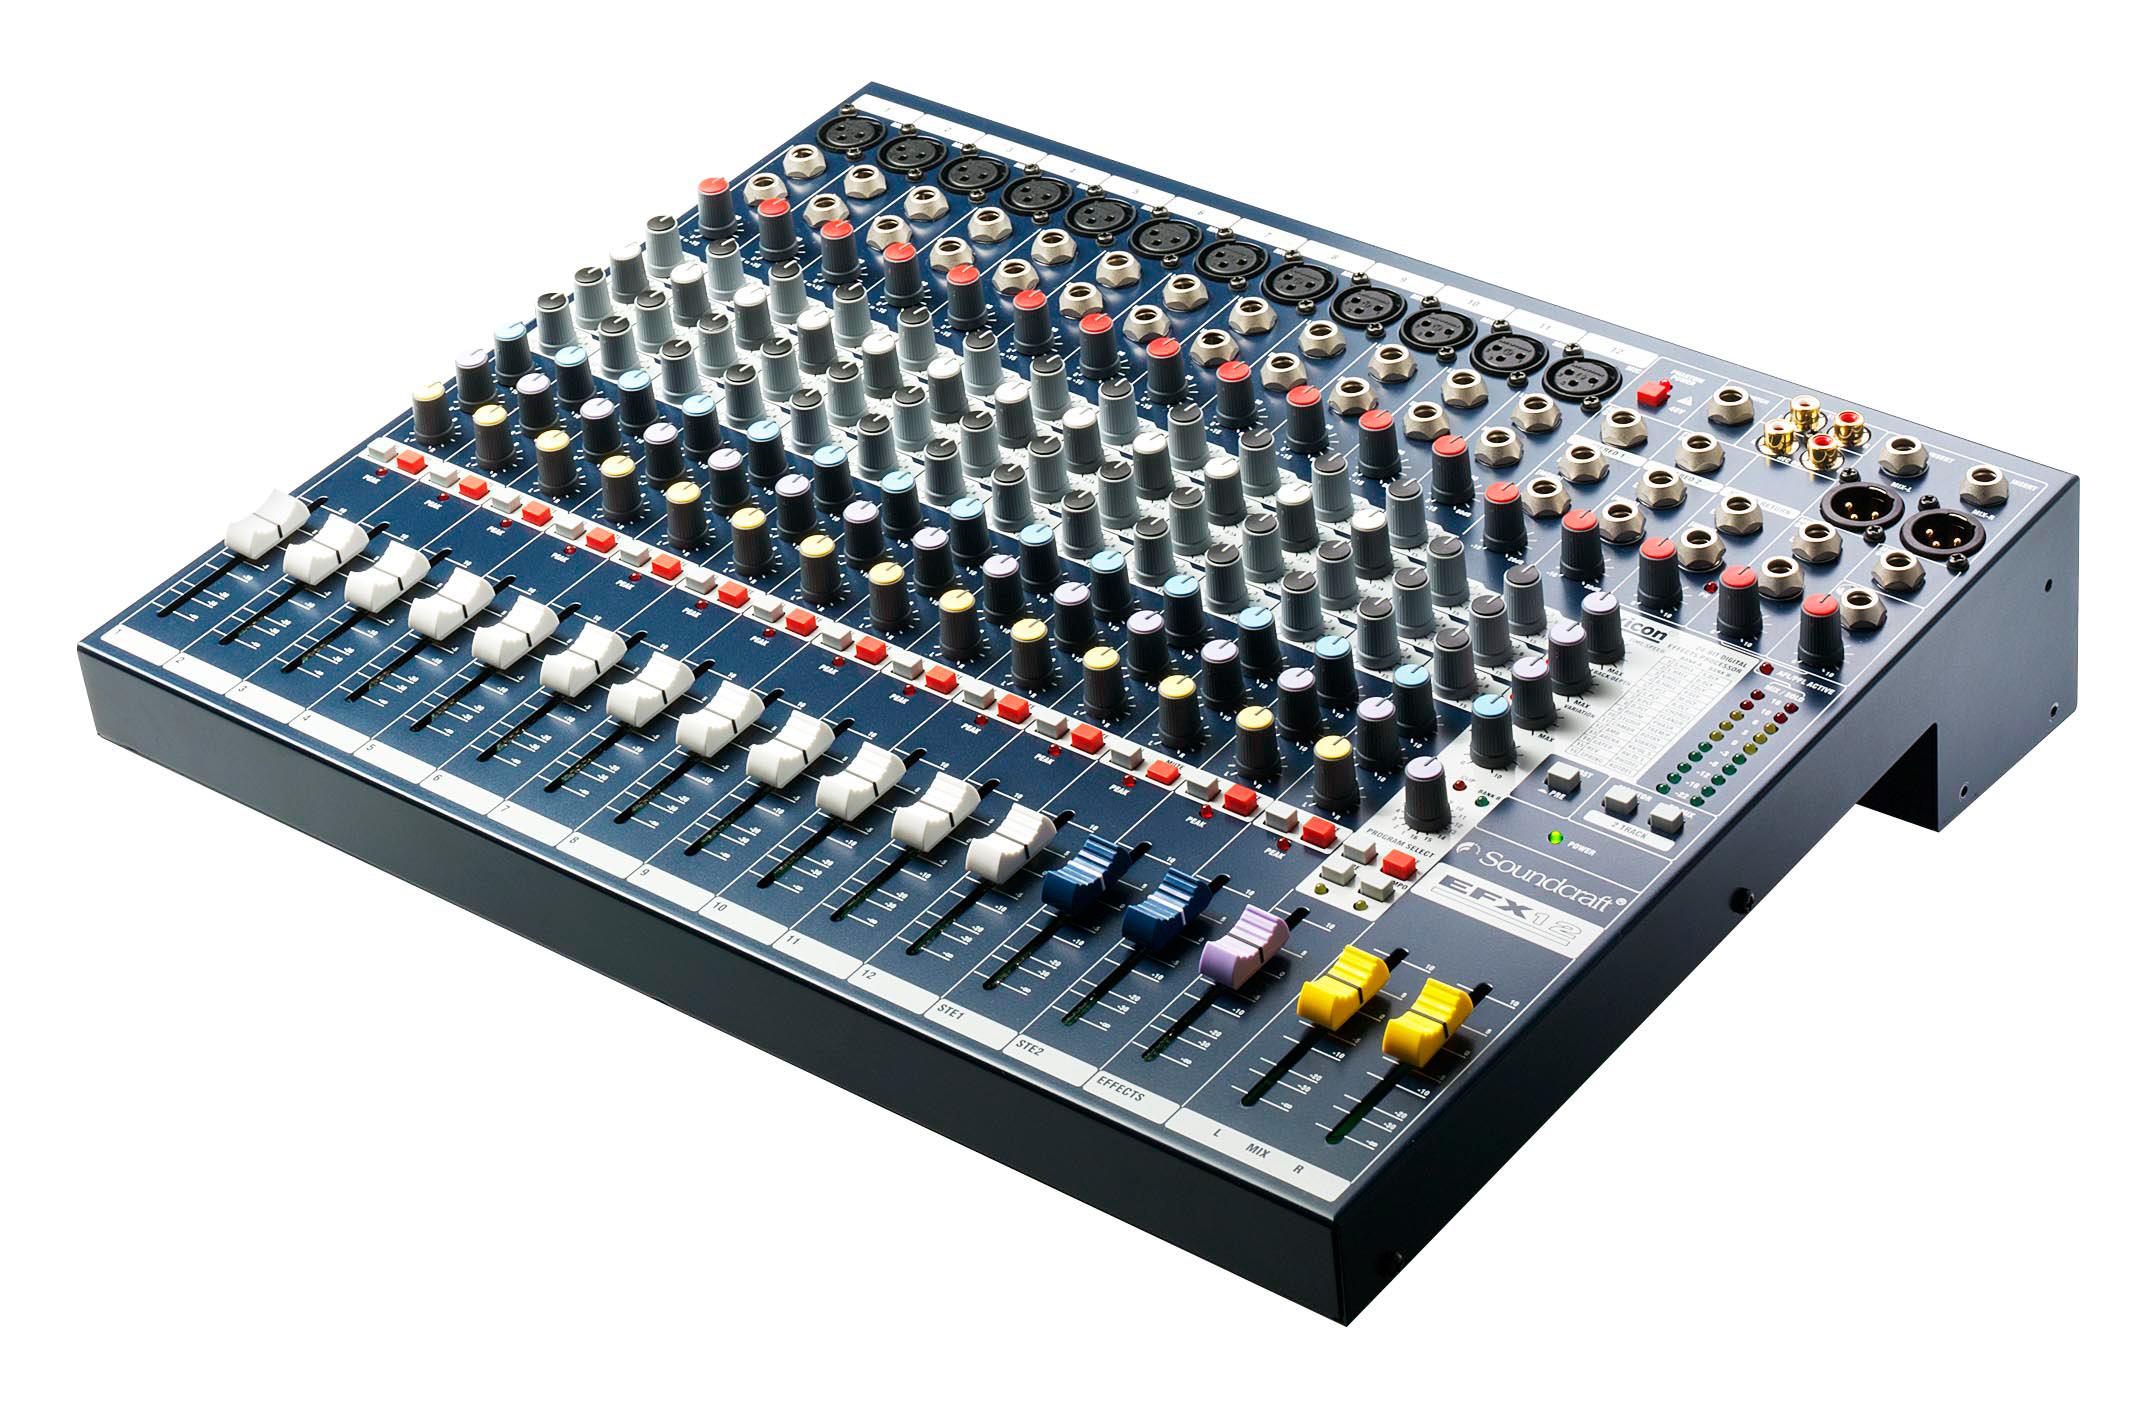 soundcraft efx12 k us 12 channel 2 bus audio mixer with lexicon fx. Black Bedroom Furniture Sets. Home Design Ideas